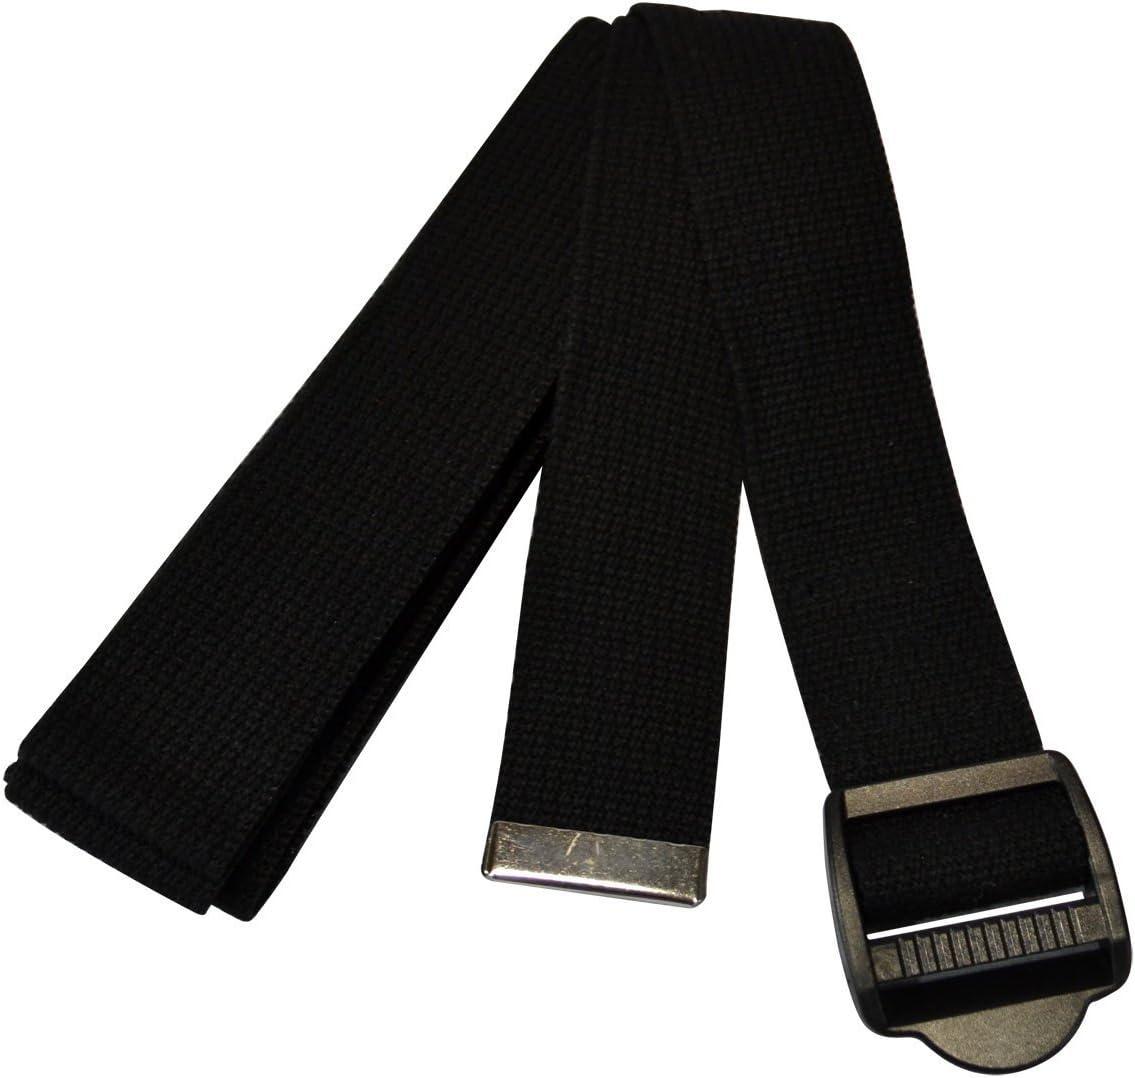 YogaAccessories 10 Cinch Buckle Cotton Yoga Strap